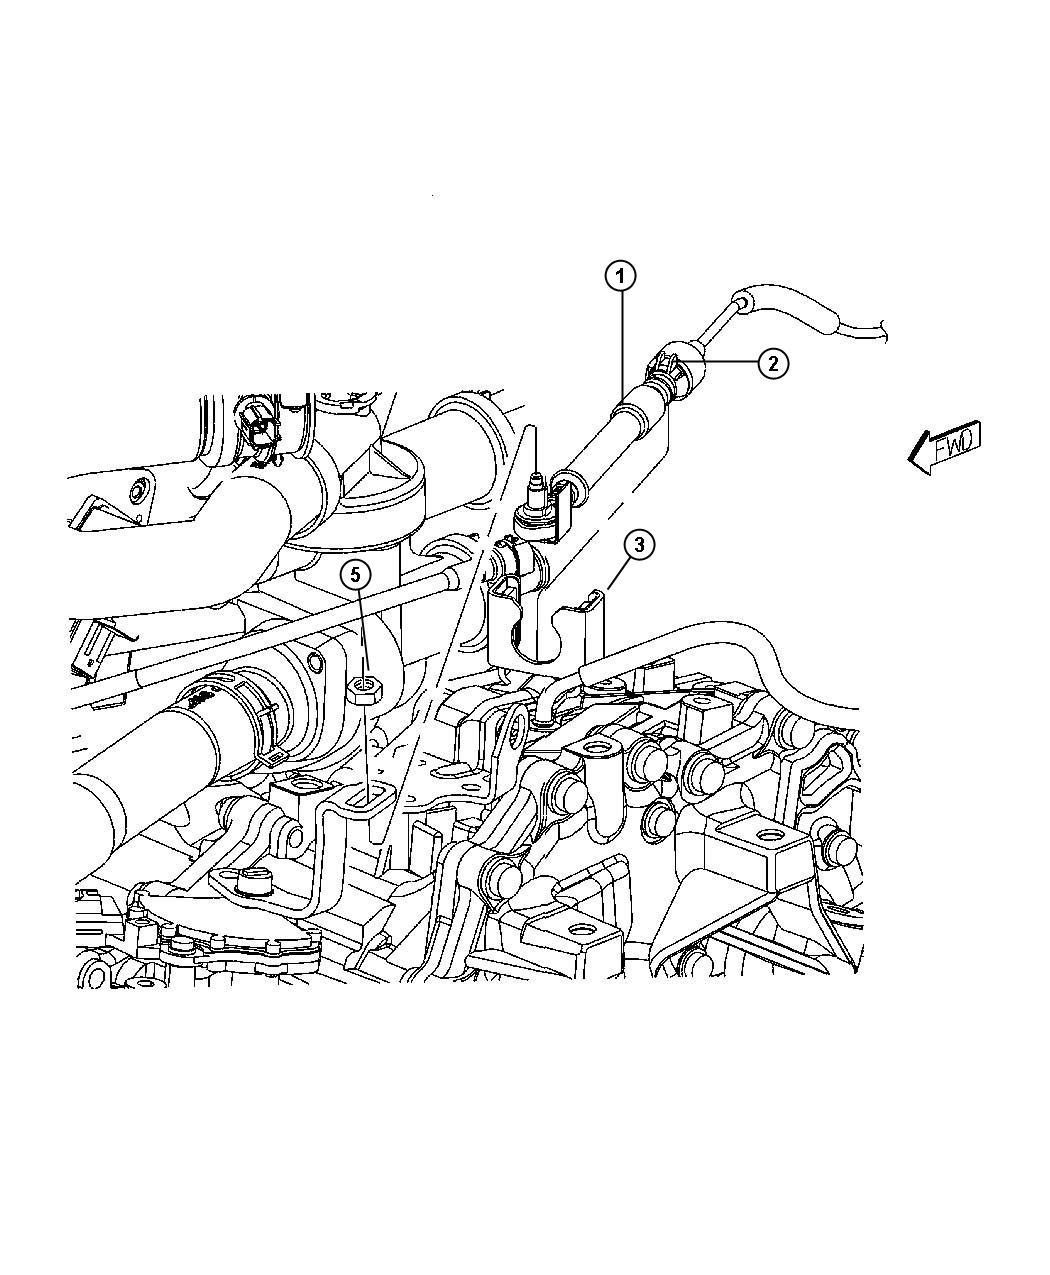 Np231 Breakdown Diagram - Wiring Diagrams Schema